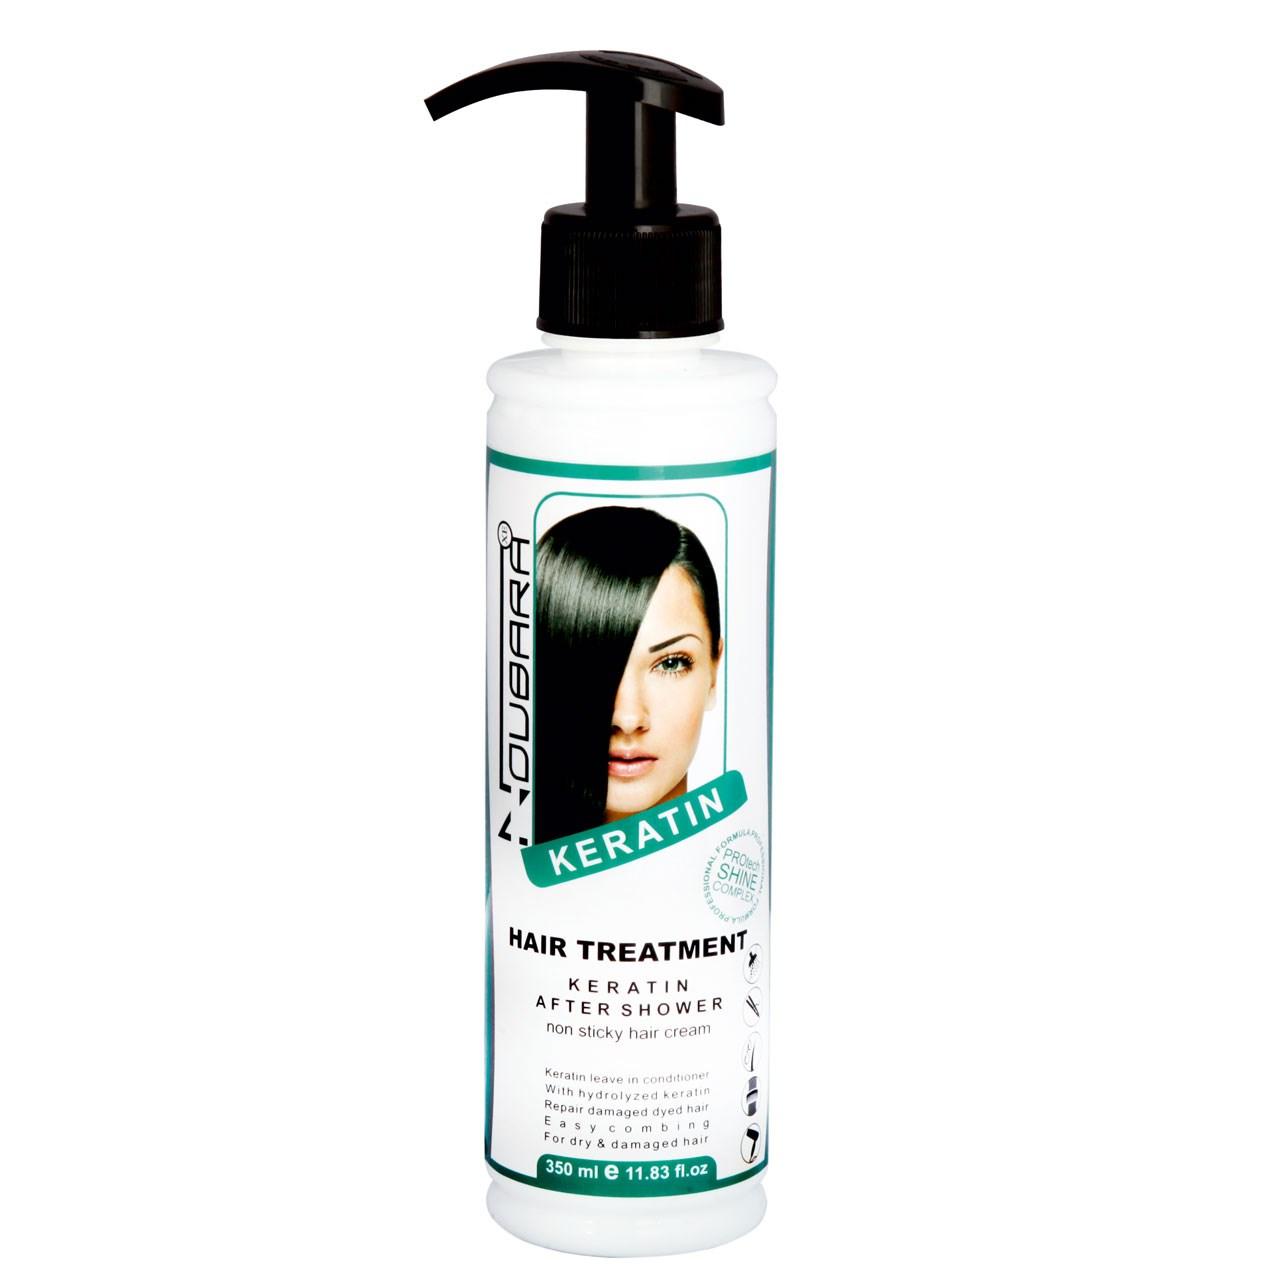 ماسک مو نوباراکس مدل Hair Treatmentحجم 350 میلی لیتر